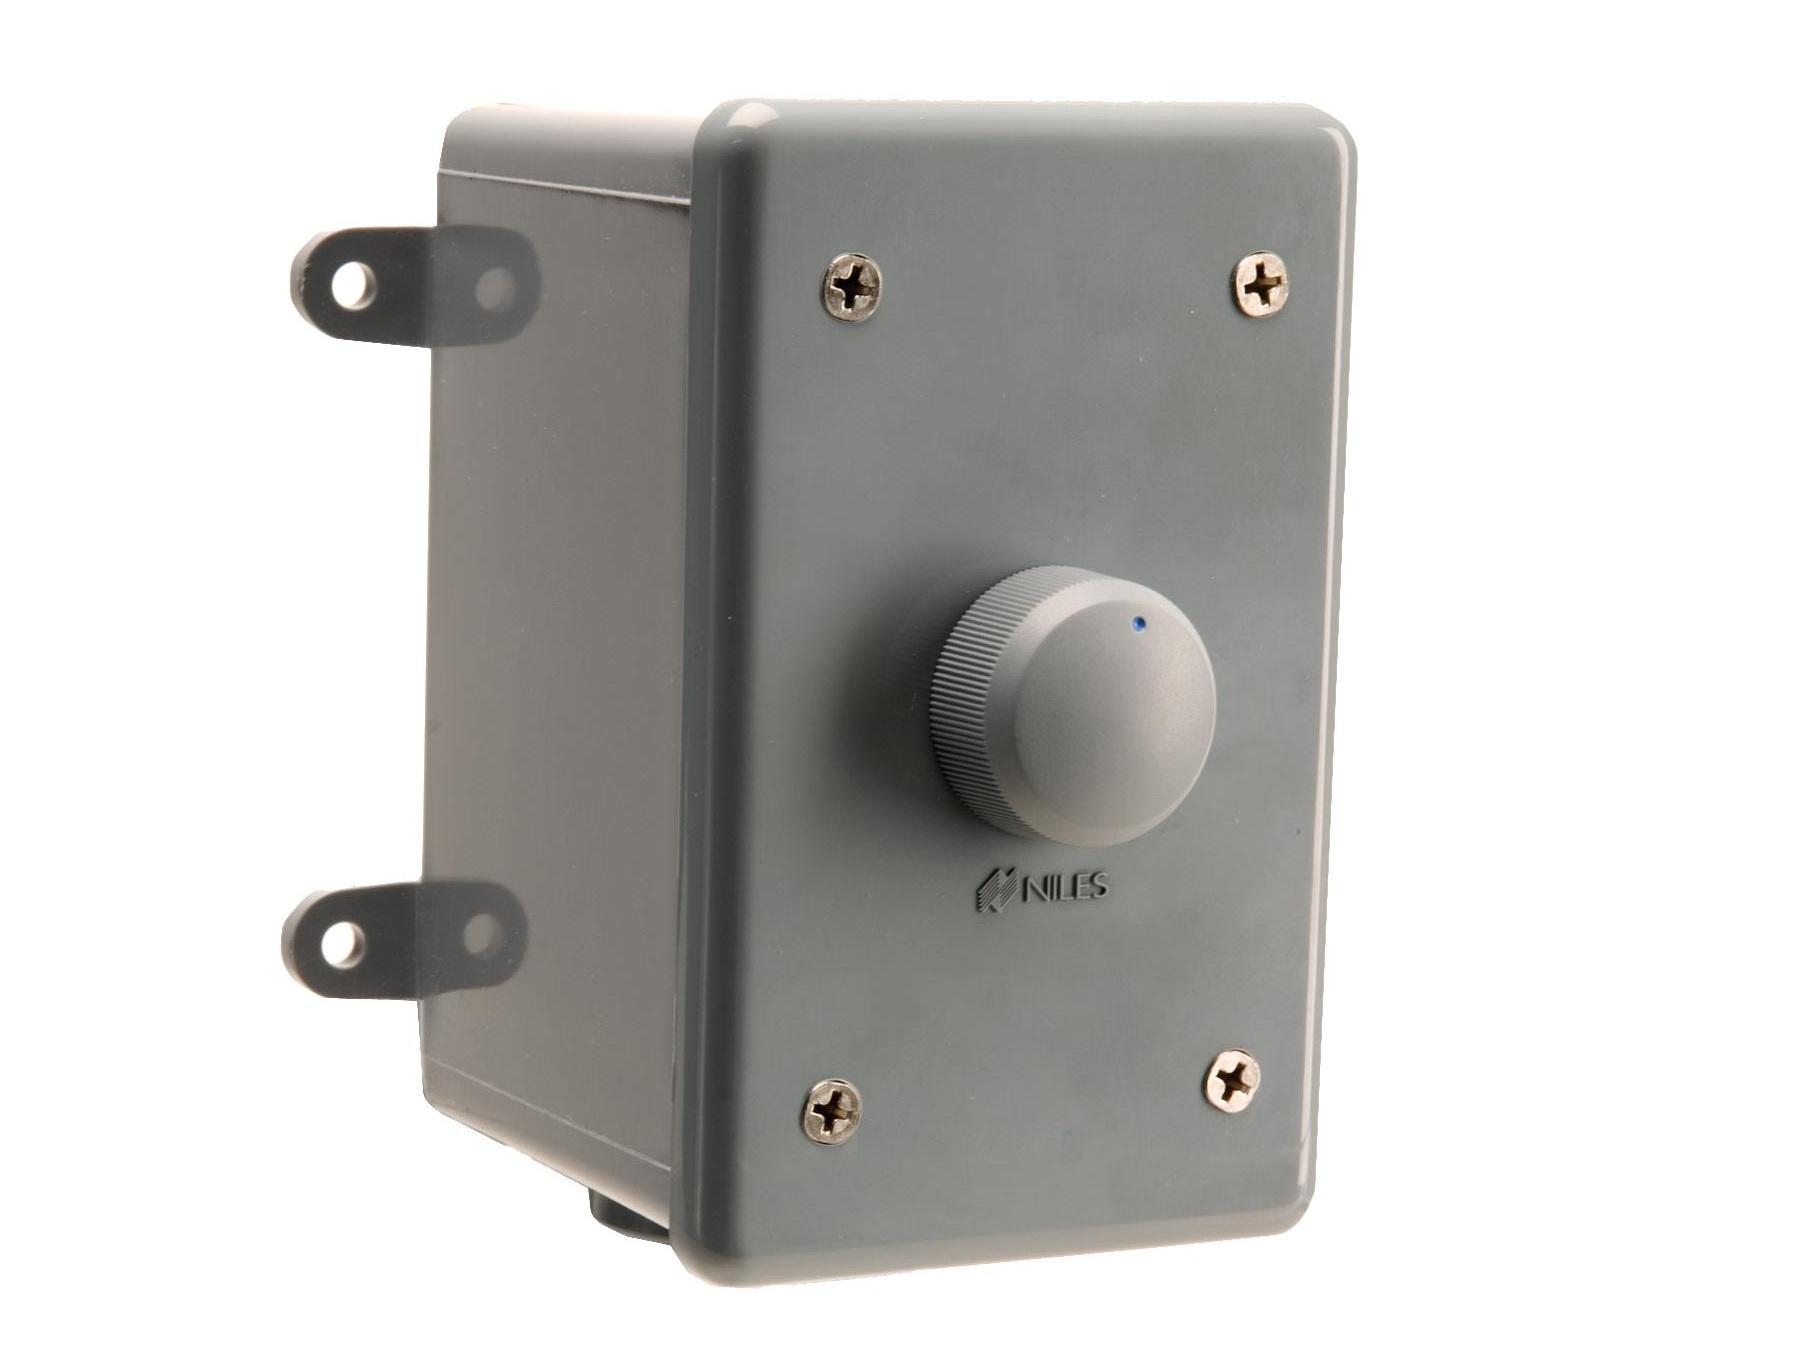 Niles WVC100E Weatherproof Stereo Volume Control (100-200W/54dB/1X-2X-4X-8X)